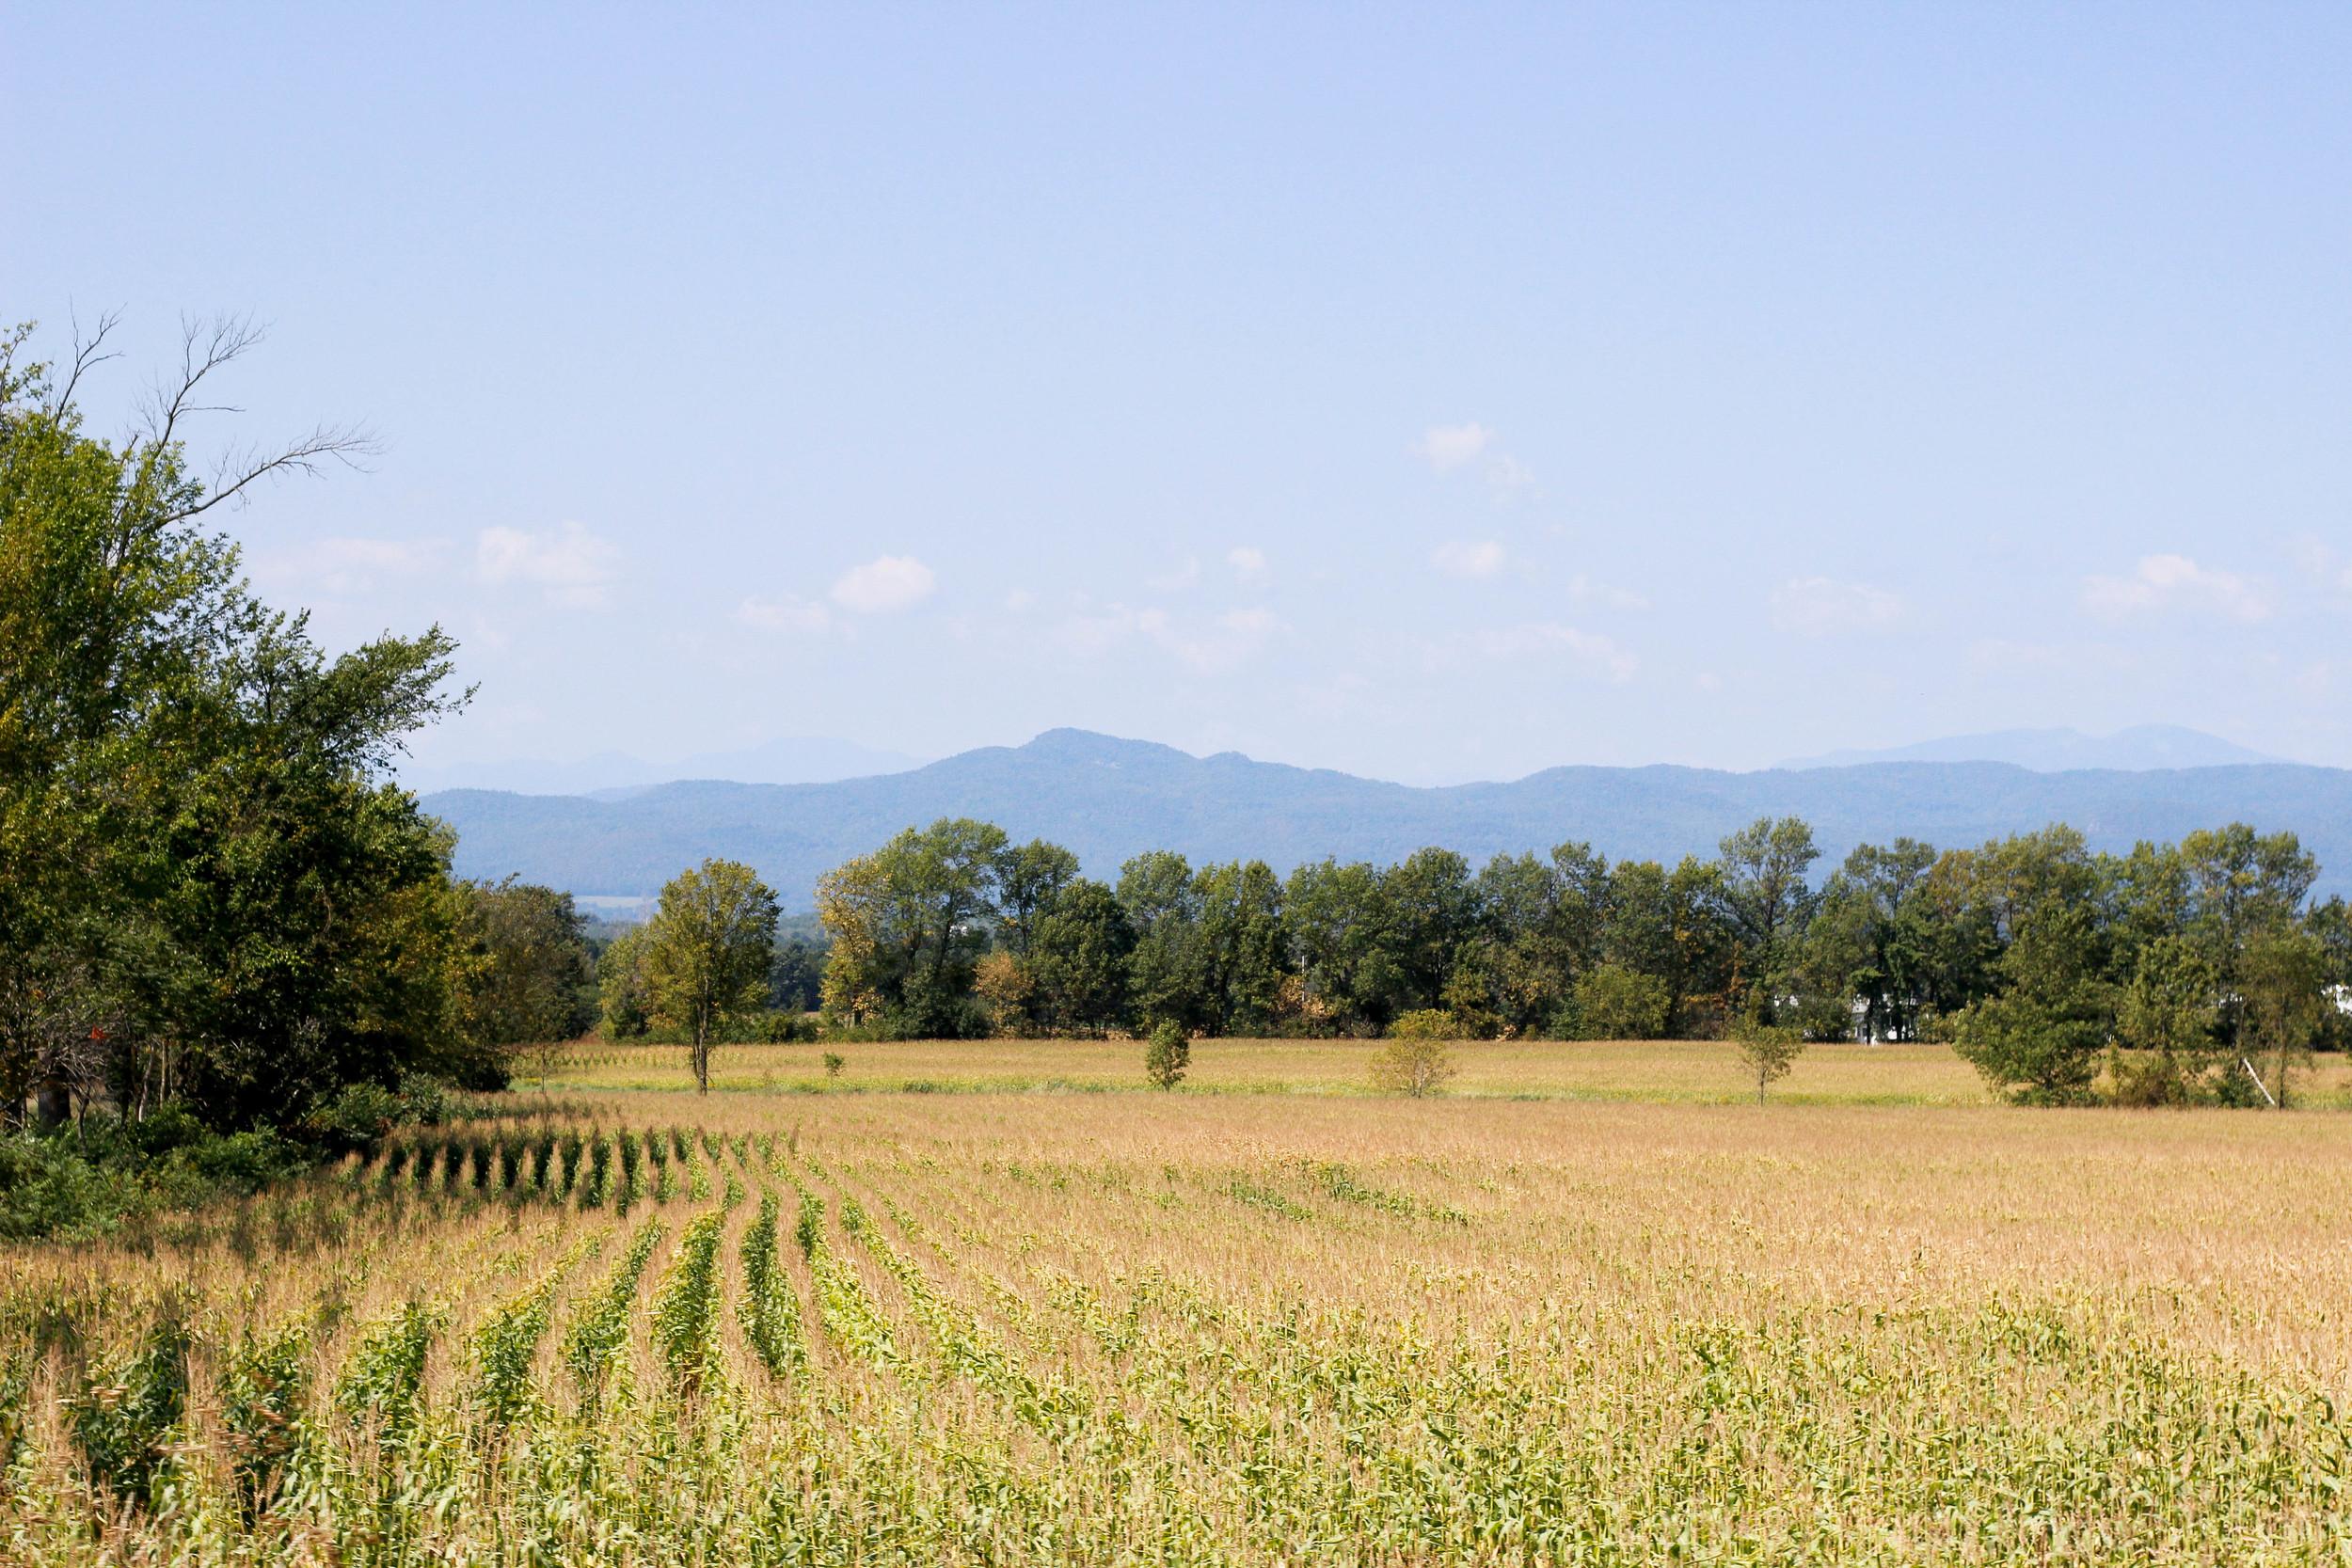 Hinesburg, Vermont - Sep 2015